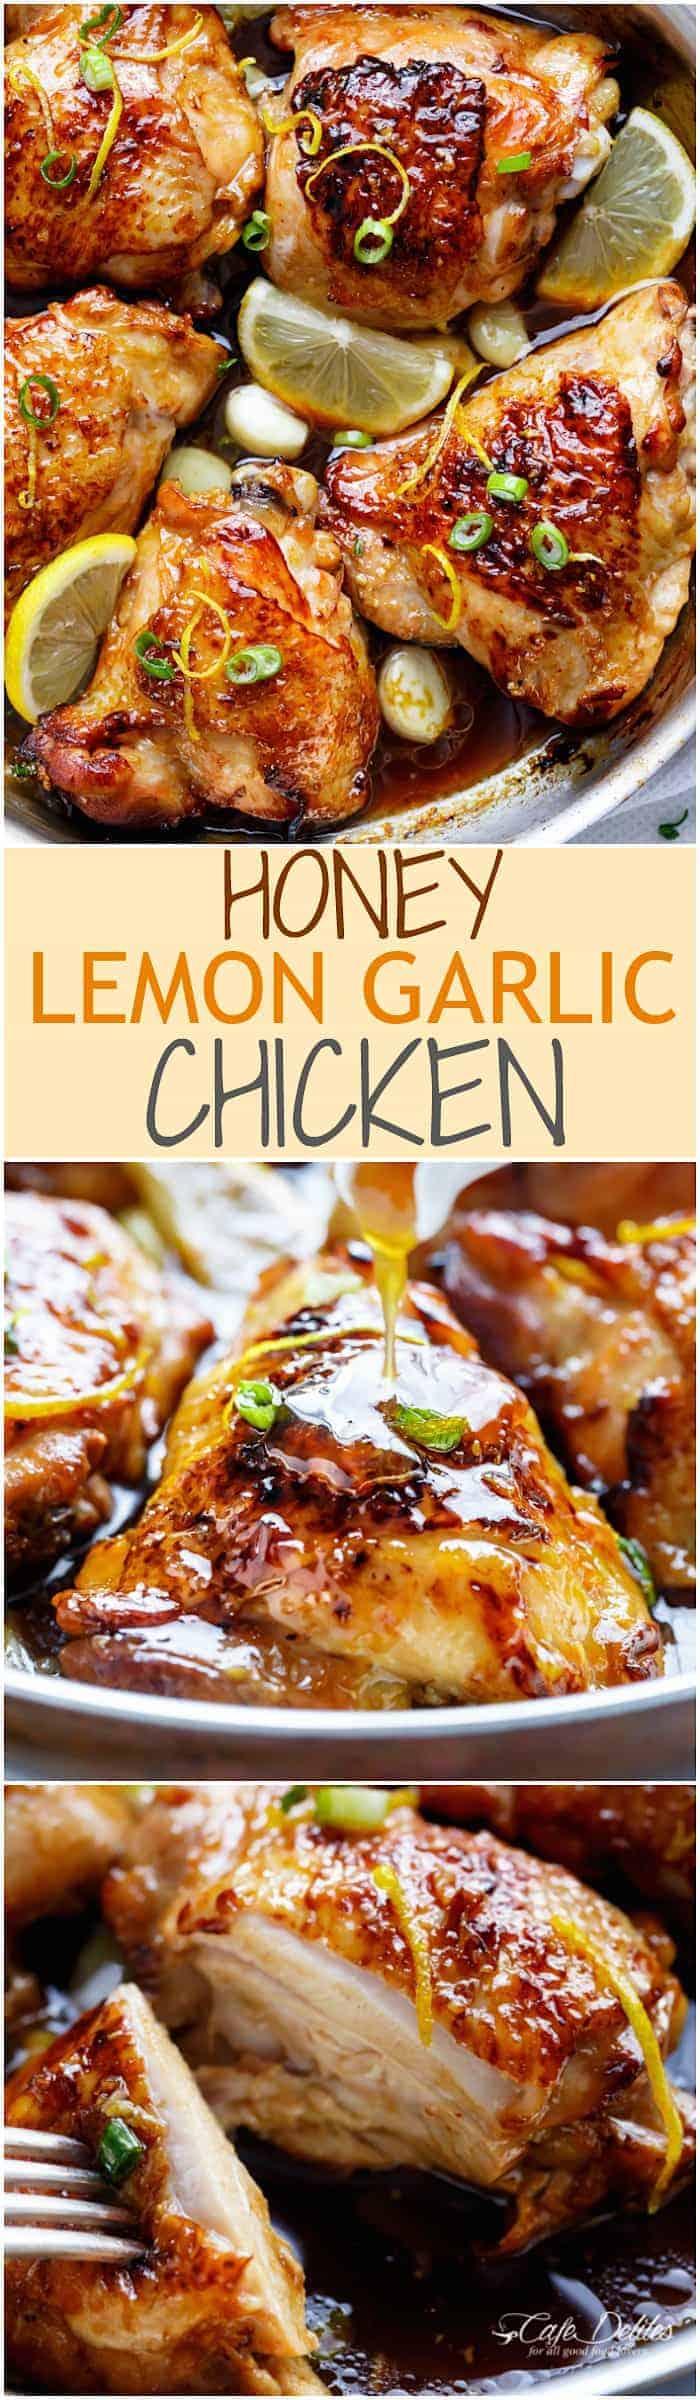 Honey Lemon Garlic Chicken with a crispy skin and a sweet, sticky ...